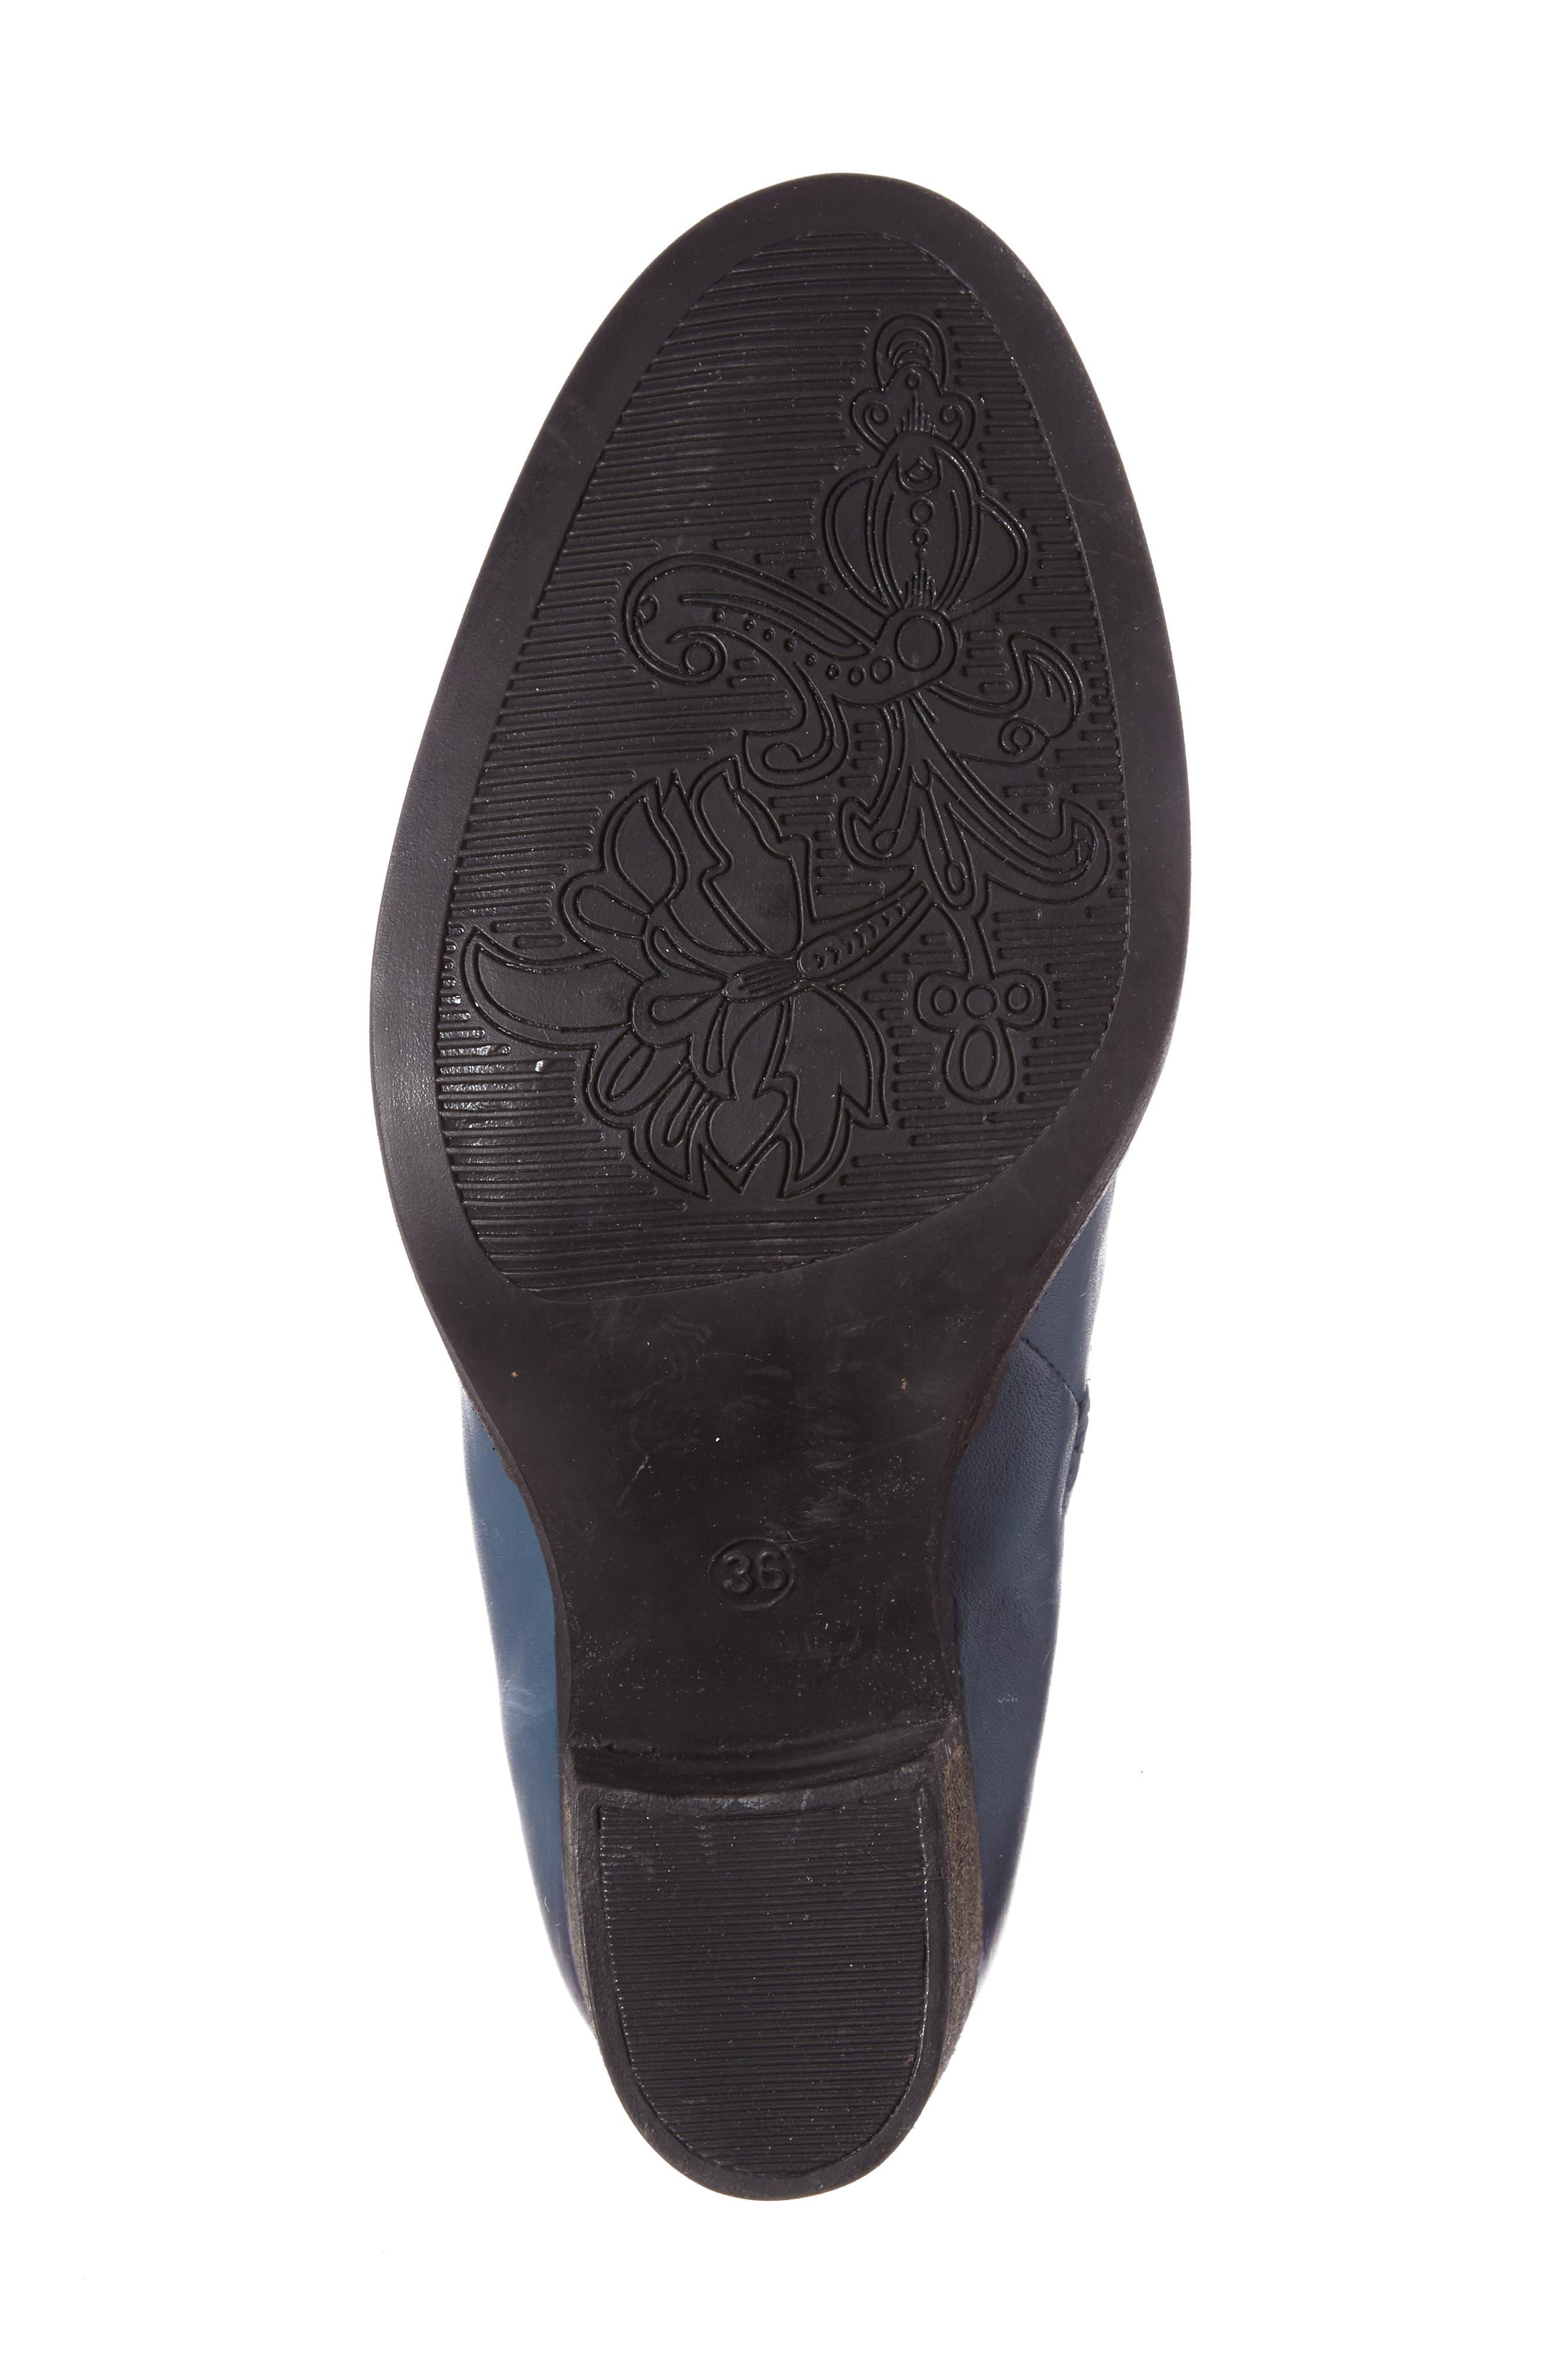 Belfielding Waterproof Chelsea Boot,                             Alternate thumbnail 4, color,                             Jeans/ Black Leather